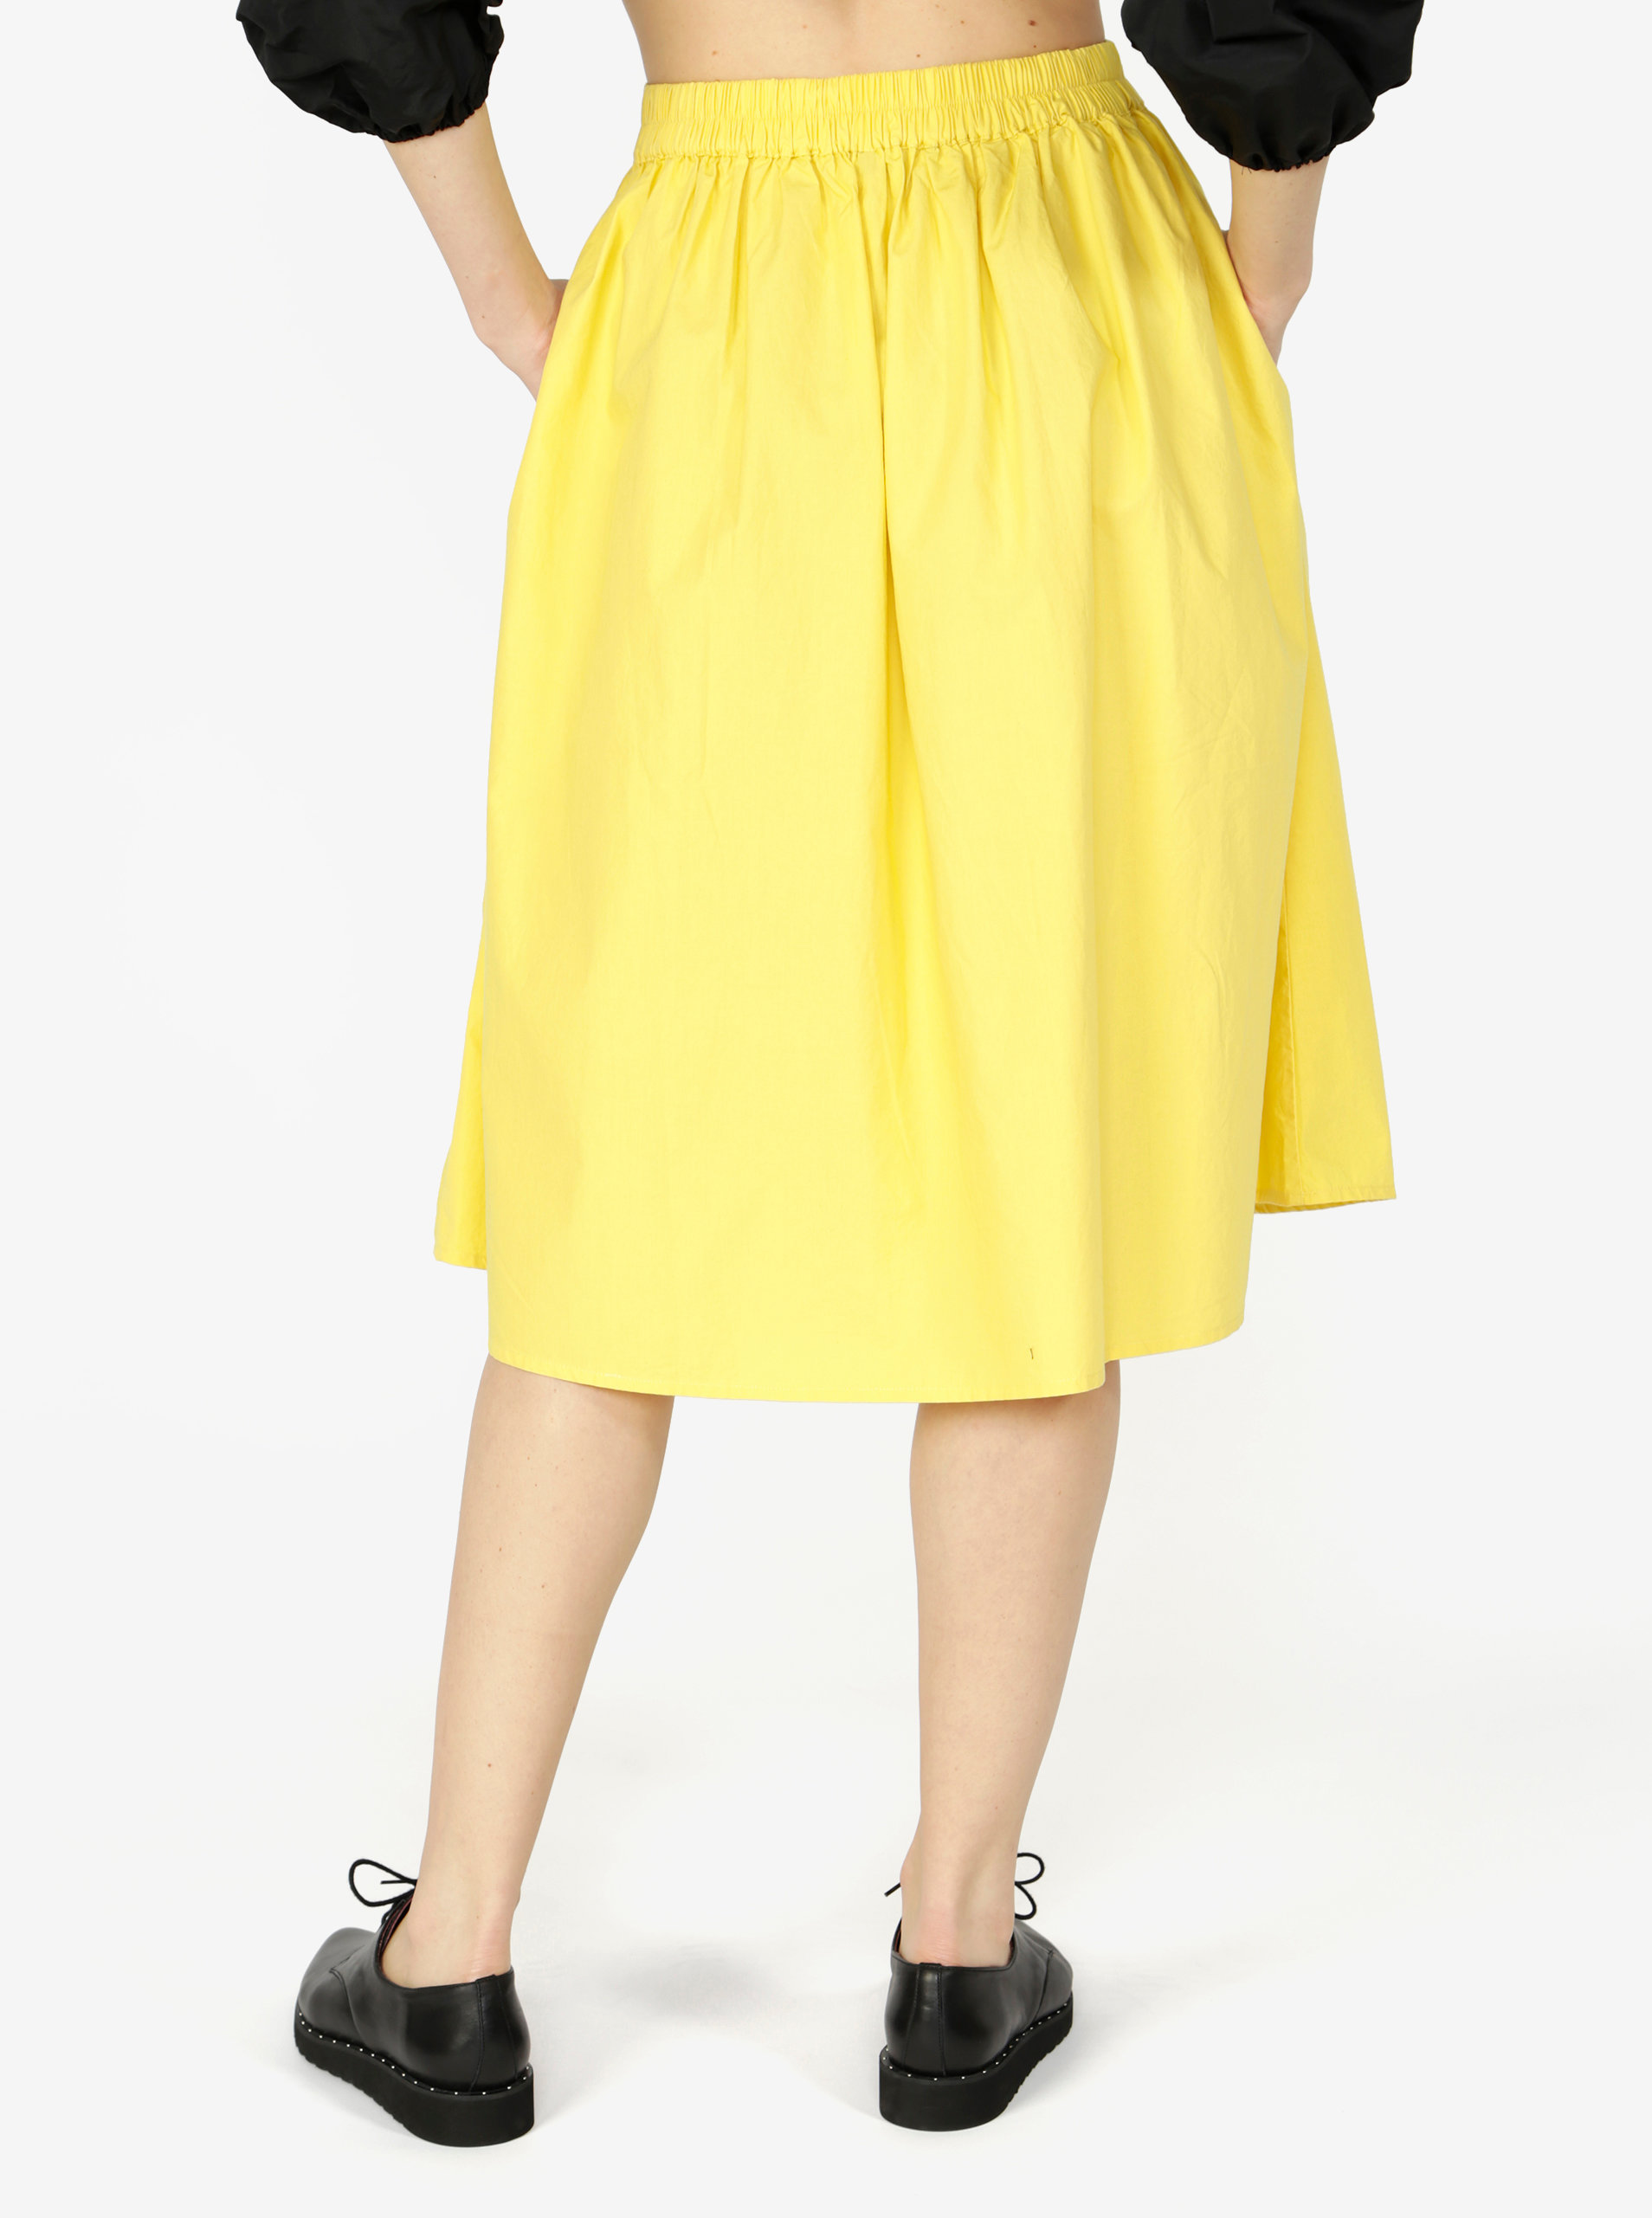 Žlutá sukně VERO MODA Ladina ... 790692c2e5